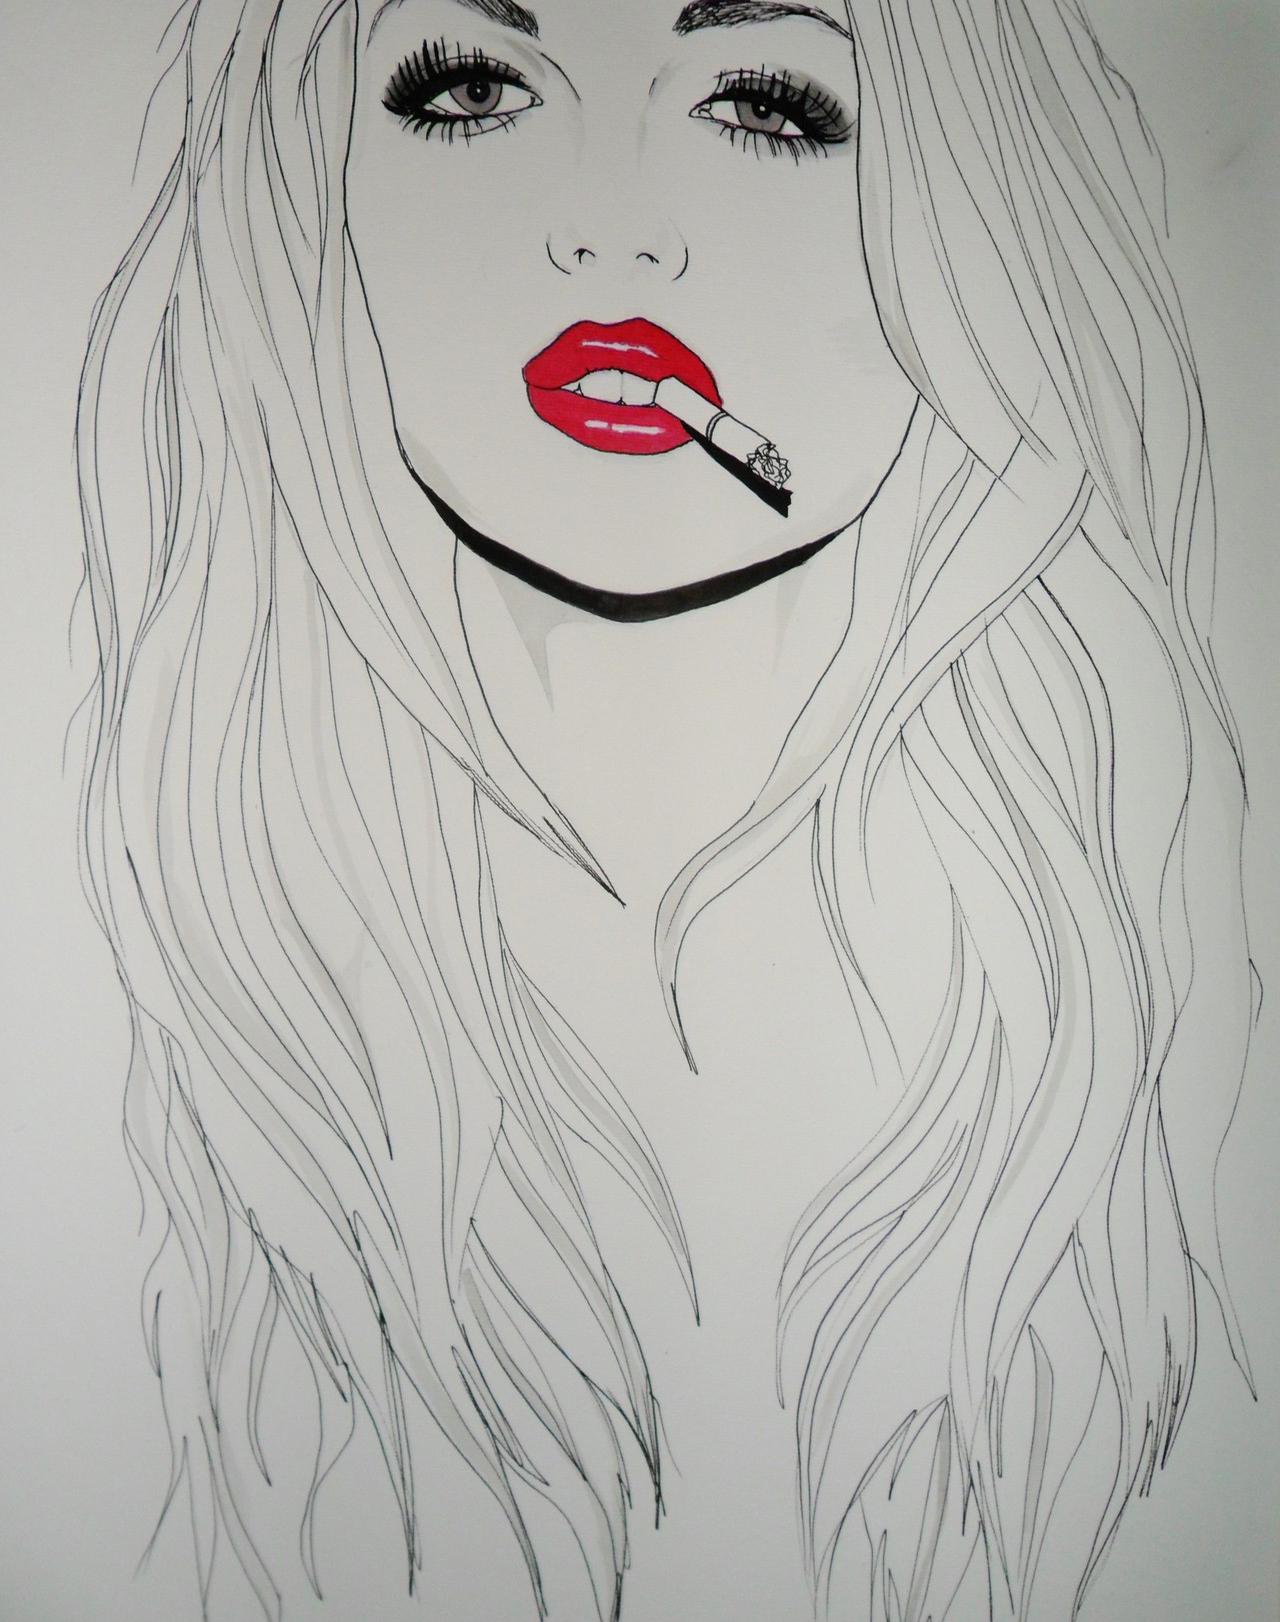 Wallpaper Face Long Hair Artwork Black Hair Mouth Nose